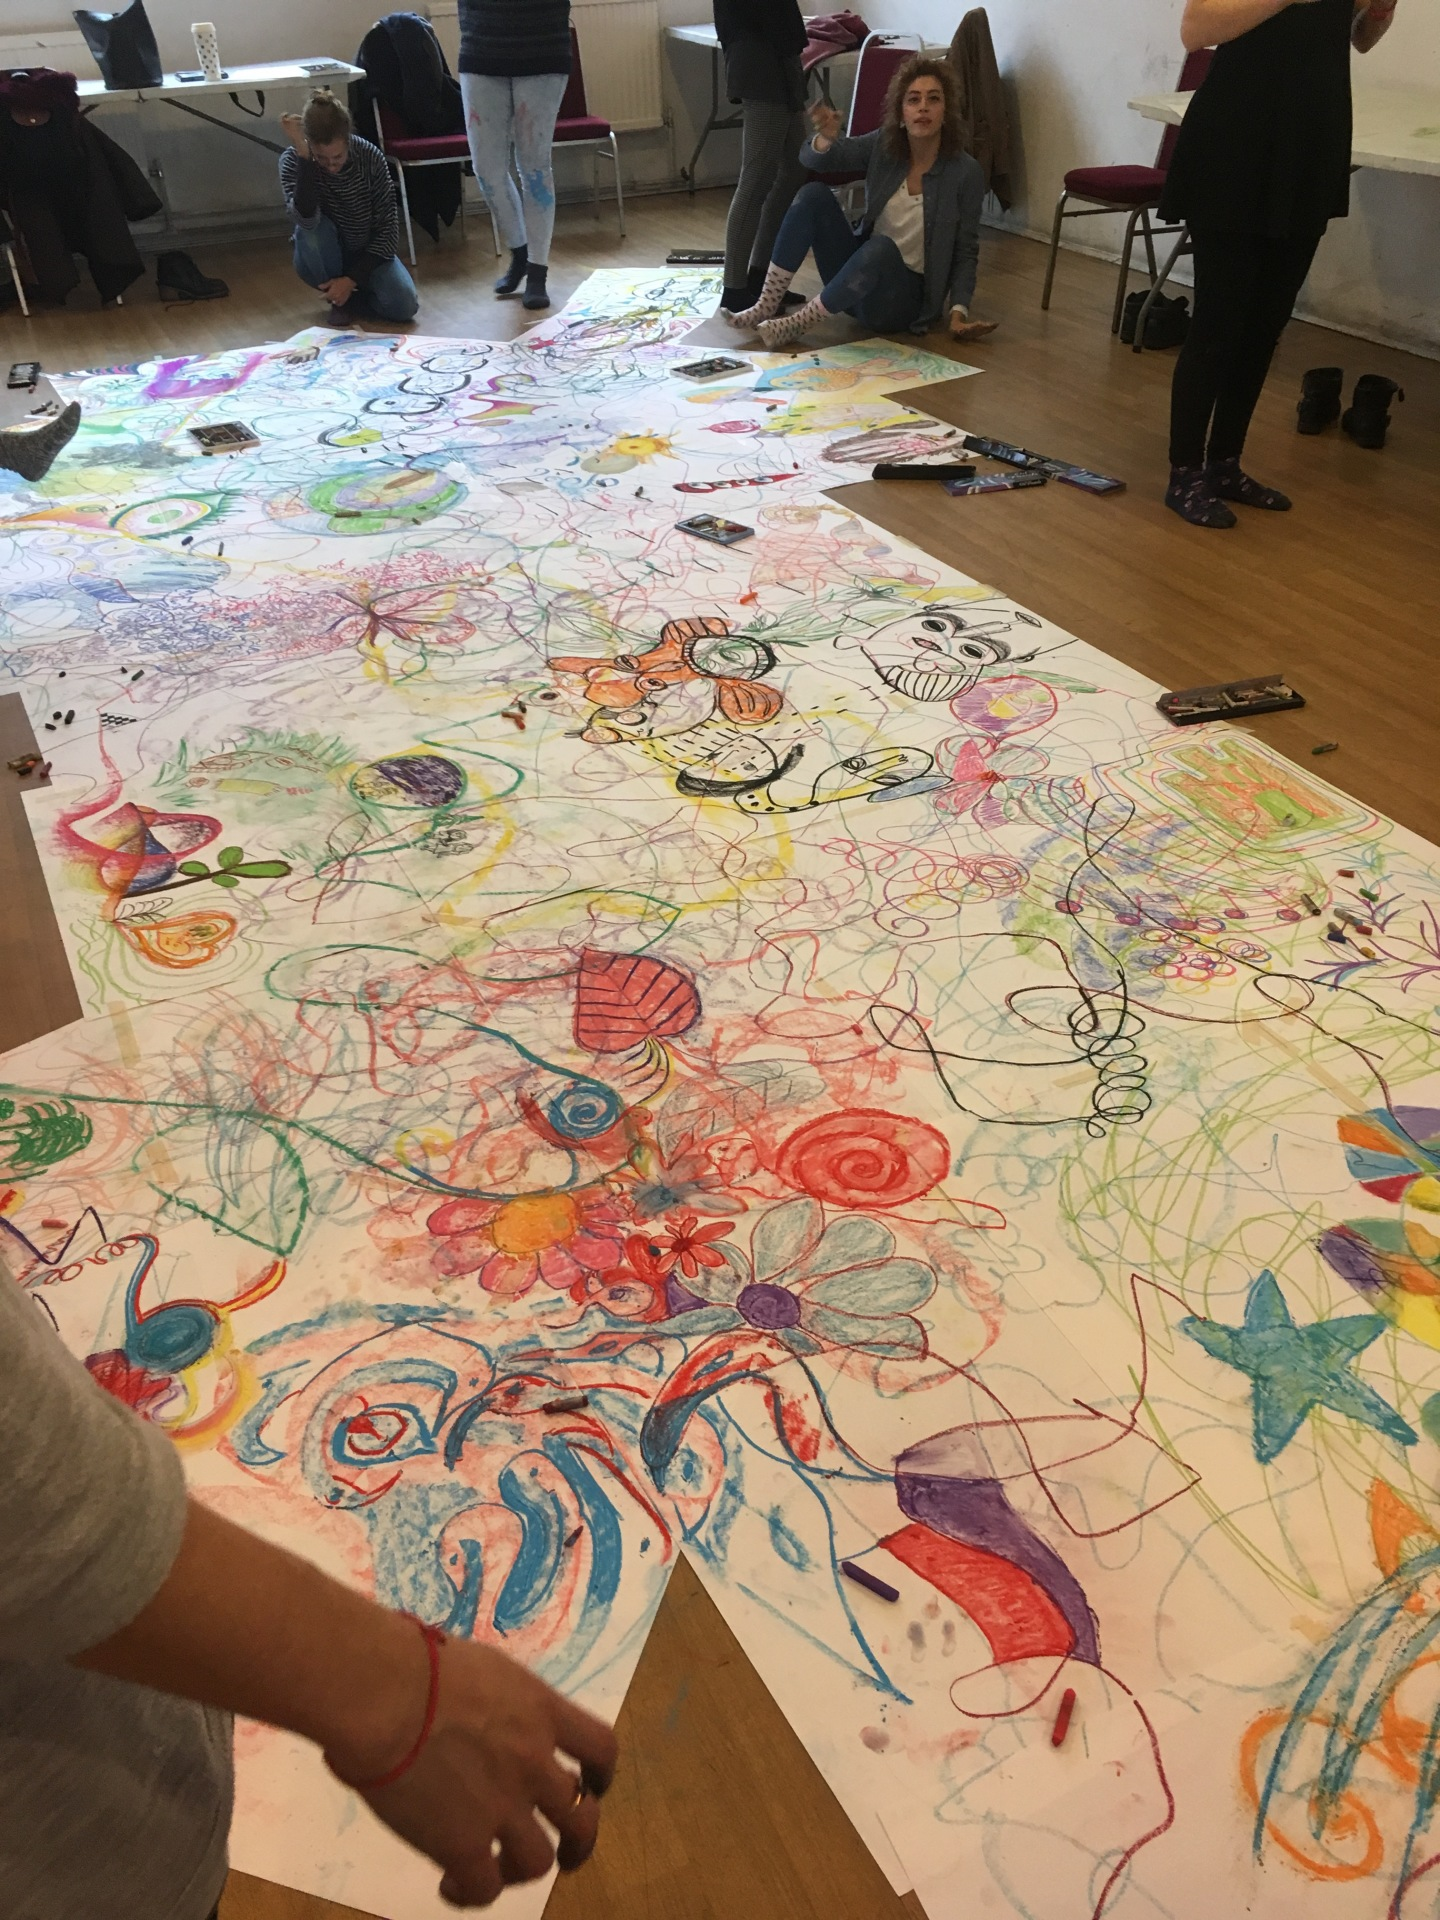 GUEST BLOG: Recovering Through Art